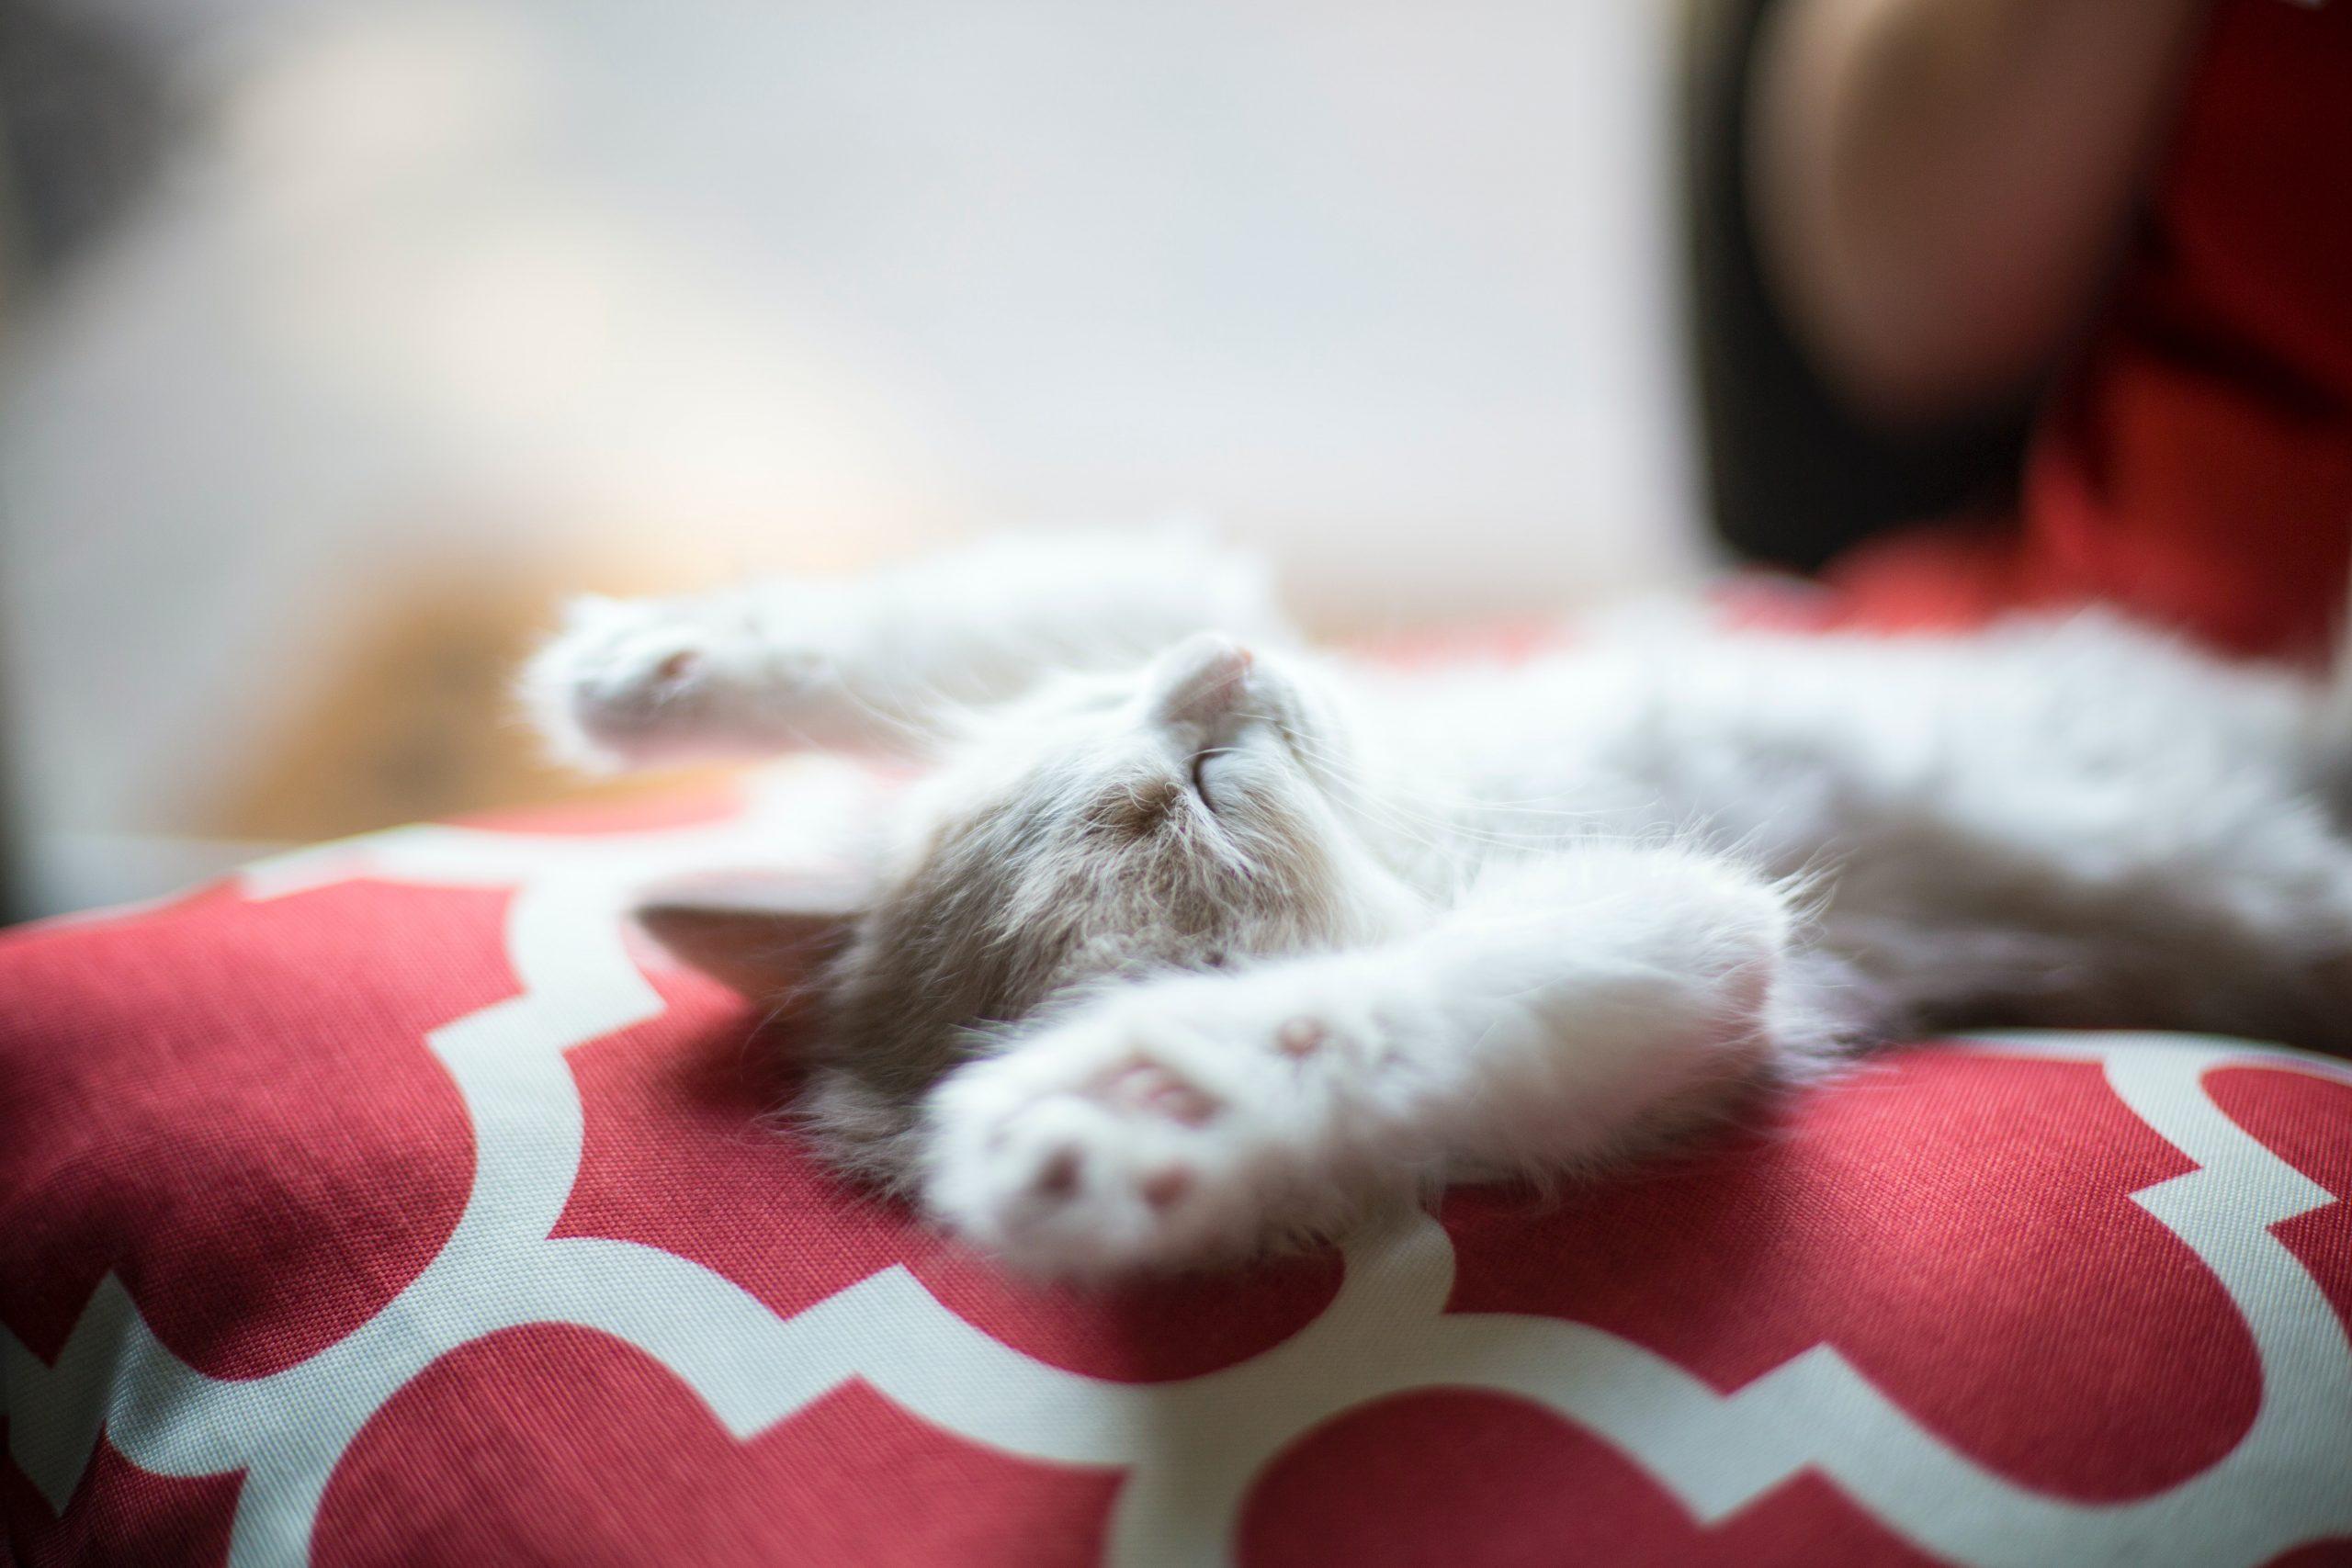 Cat Sleeping on its Back Wallpaper